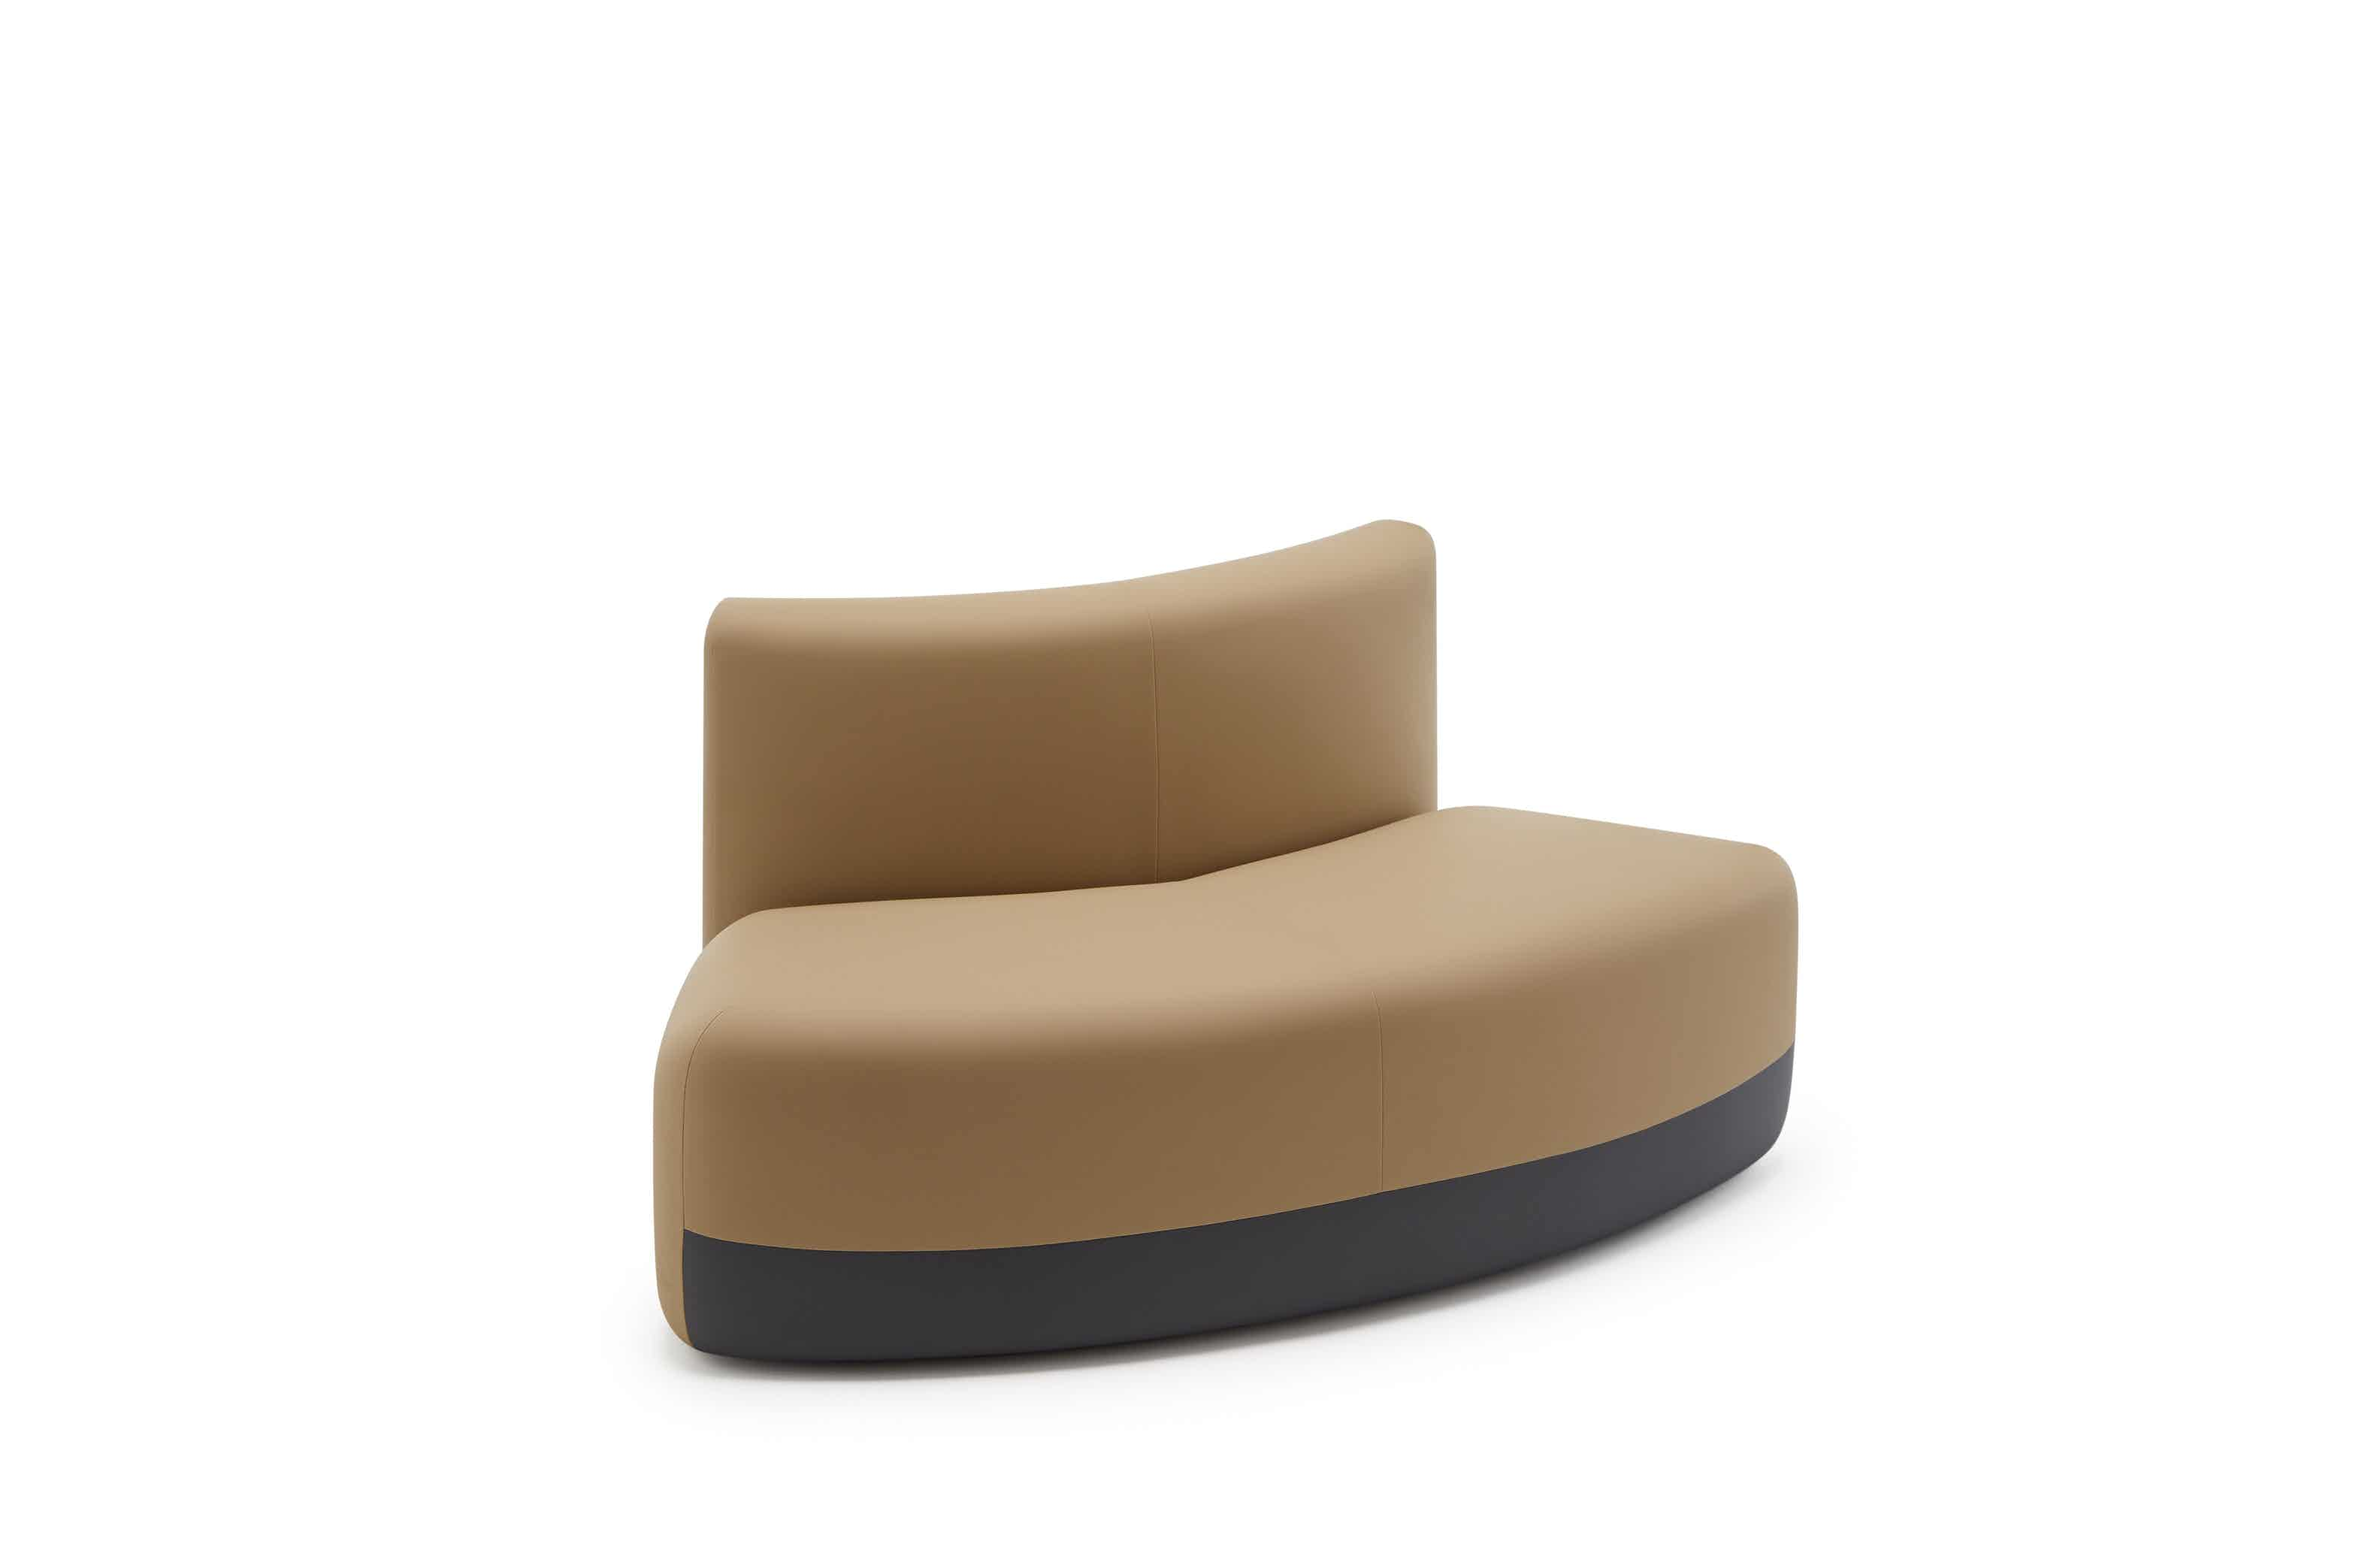 Viccarbe-small-season-sofa-haute-living